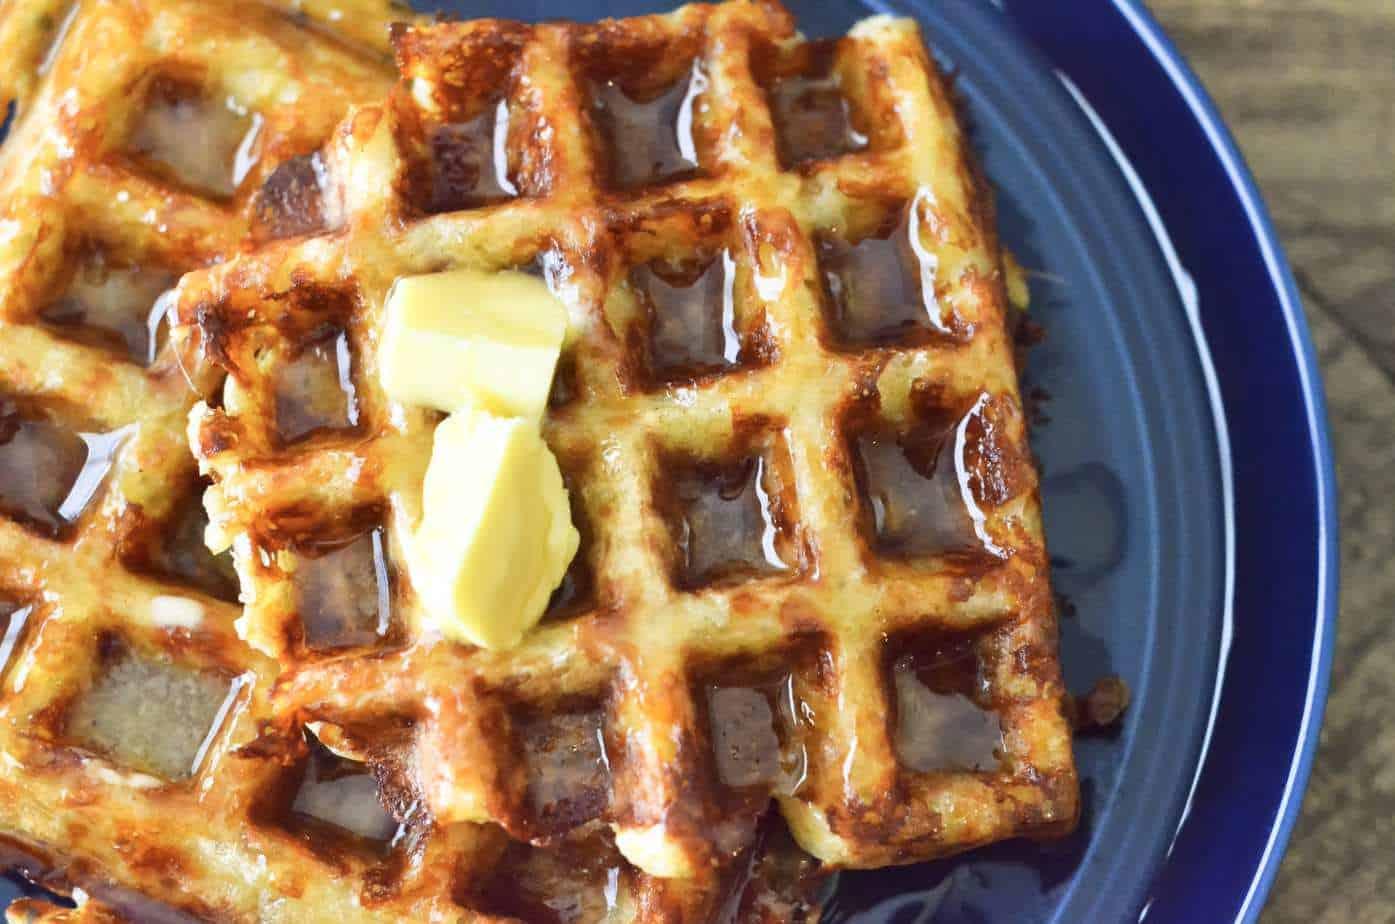 How To Make Grain Free Low Carb Keto Waffles